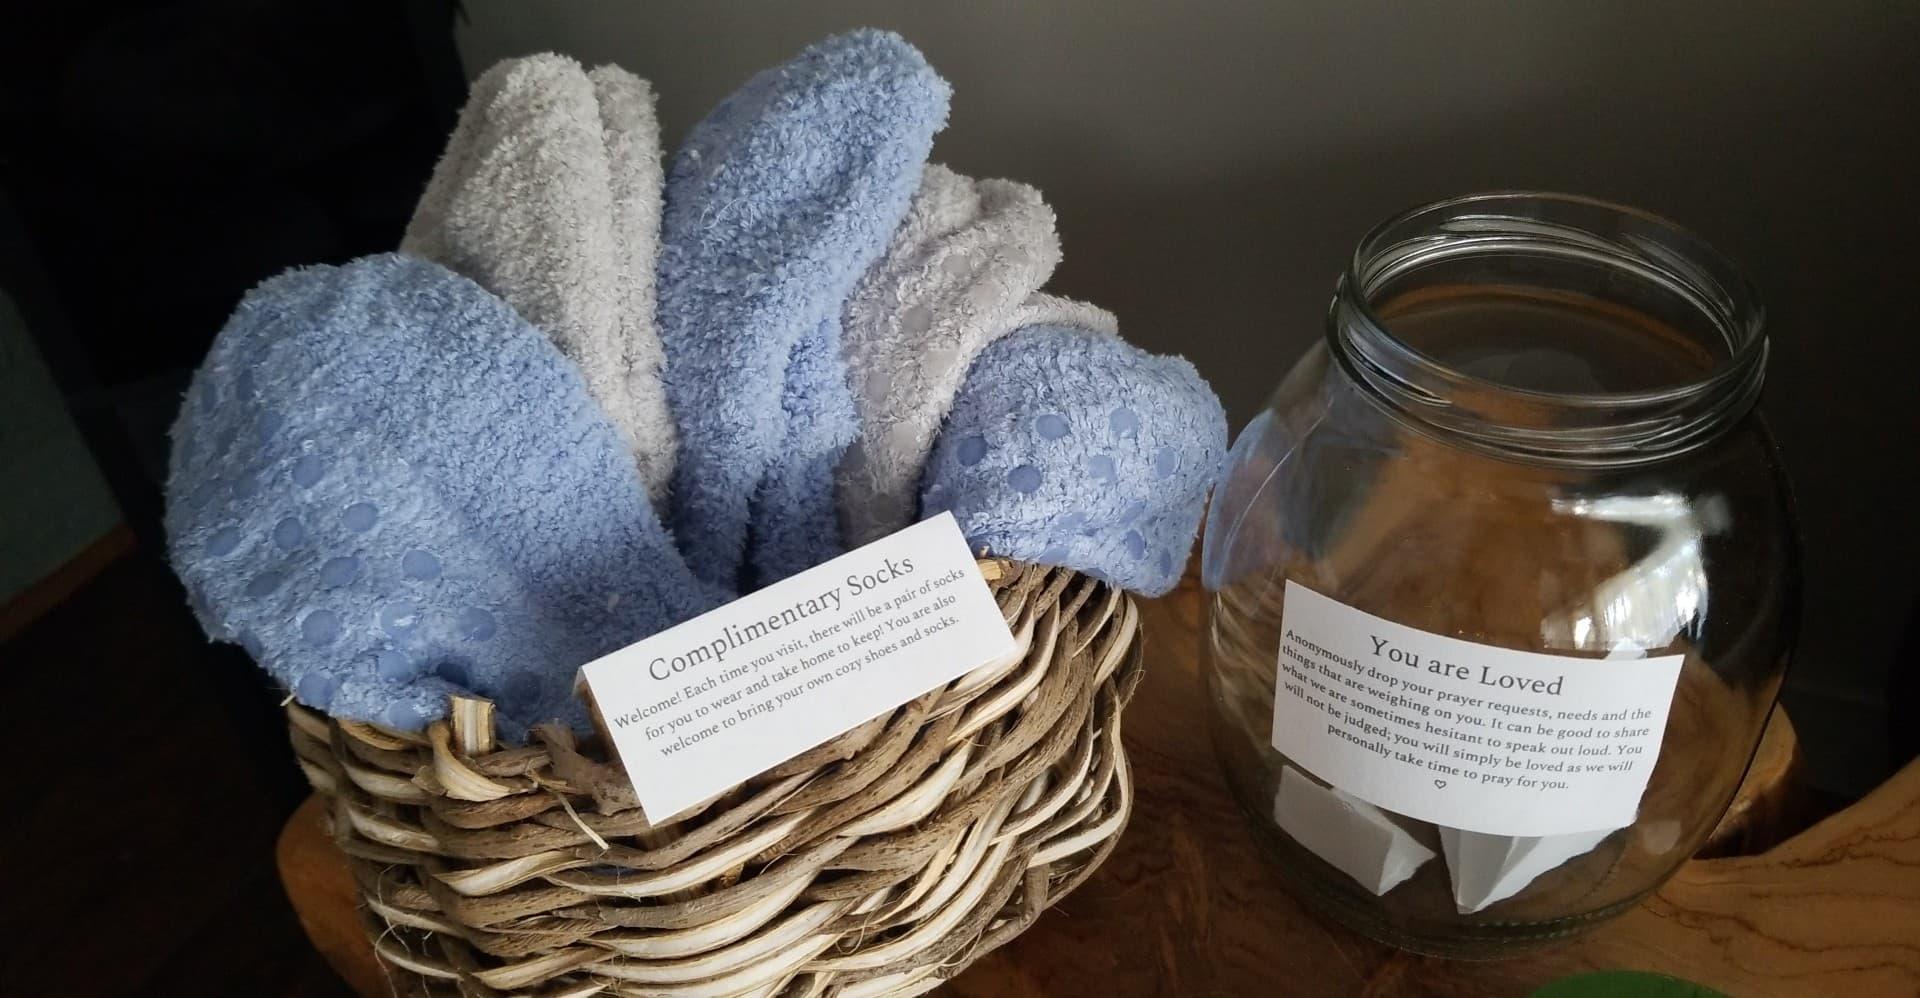 Comfy fuzzy socks and a prayer jar at the Jasper & Fern Self Care Lounge in downtown Winston-Salem, NC